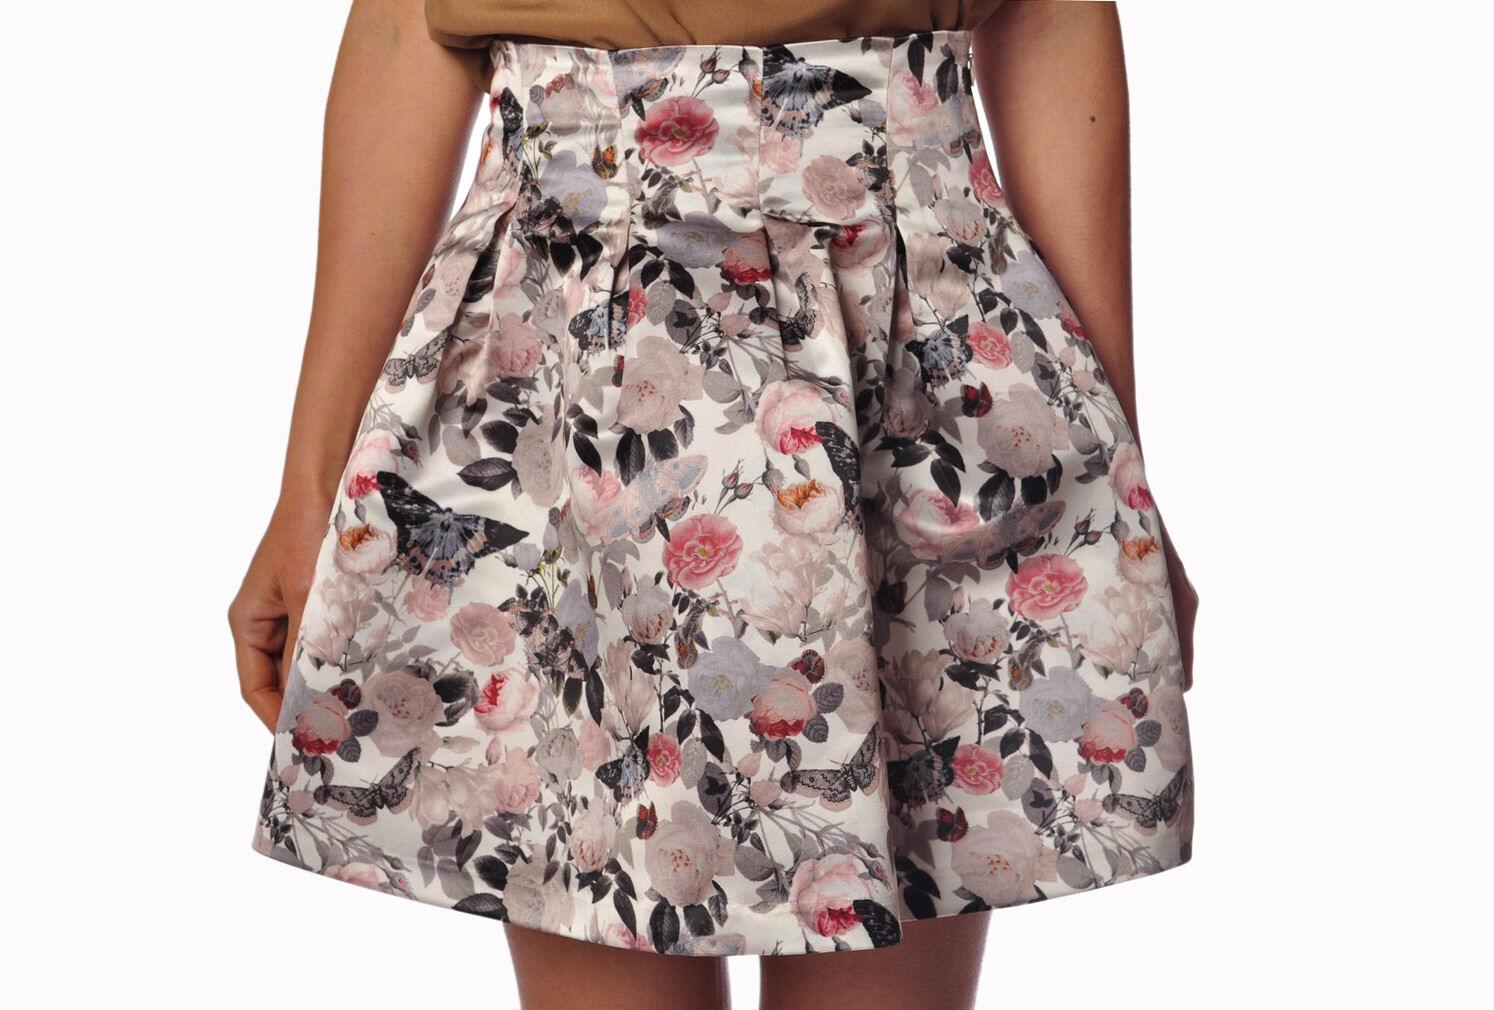 Mercì - Skirts-Skirts mini-skirts - woman - Grey - 786517C184239